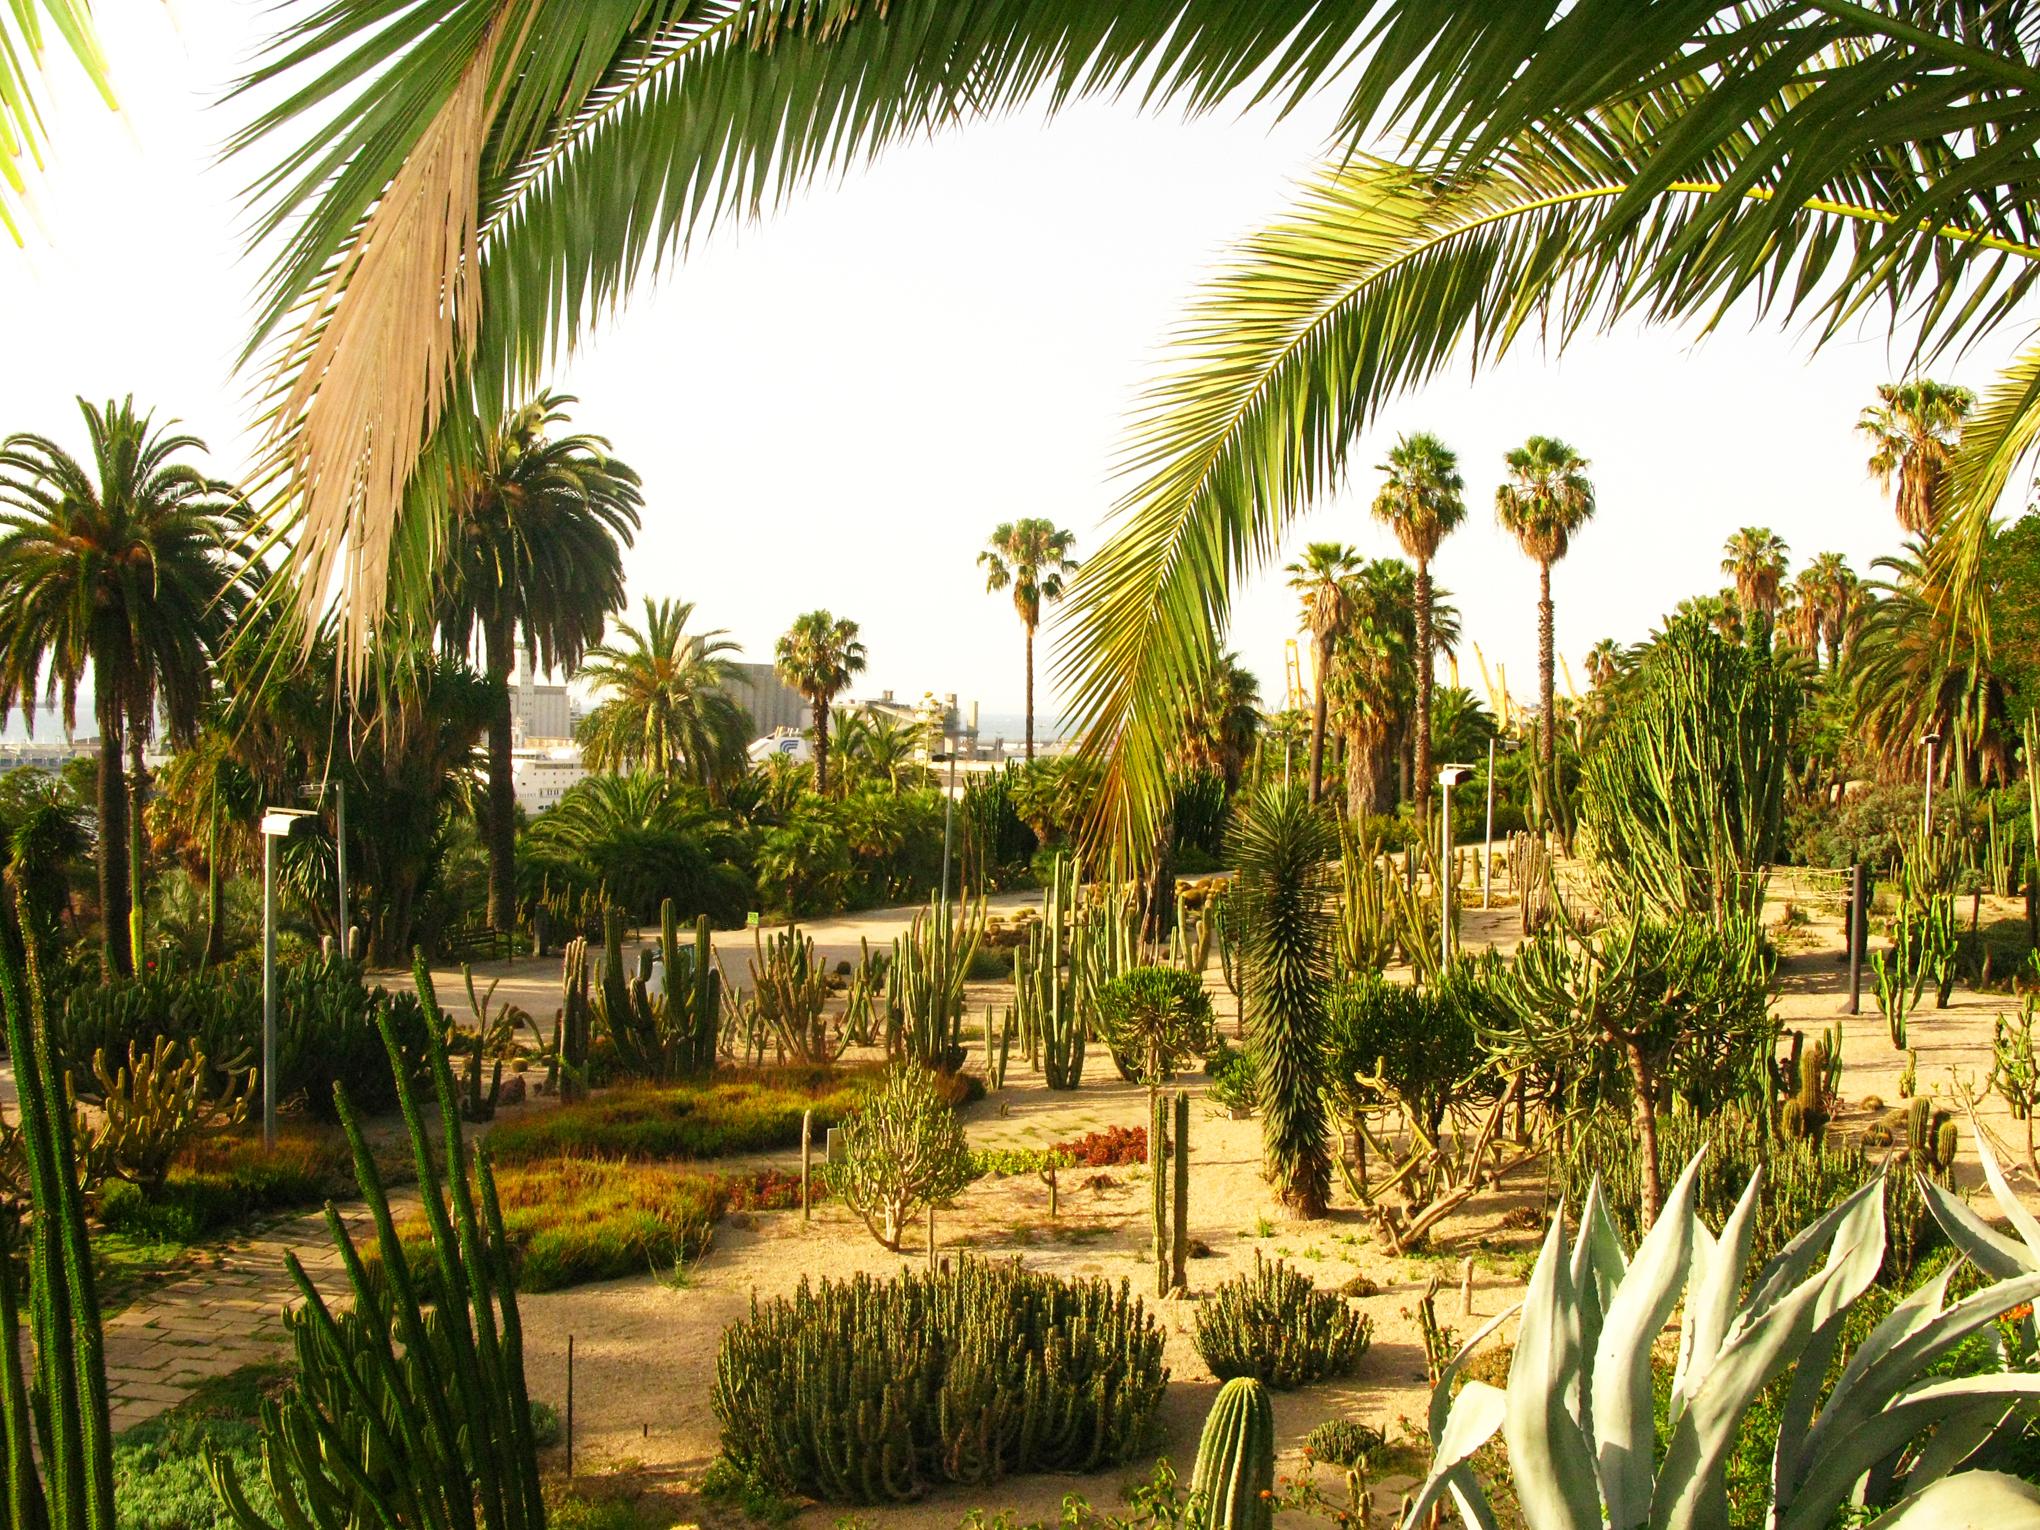 Spain moss n cinto verdaguer jardin barcelona jearld for Barcelona jardin